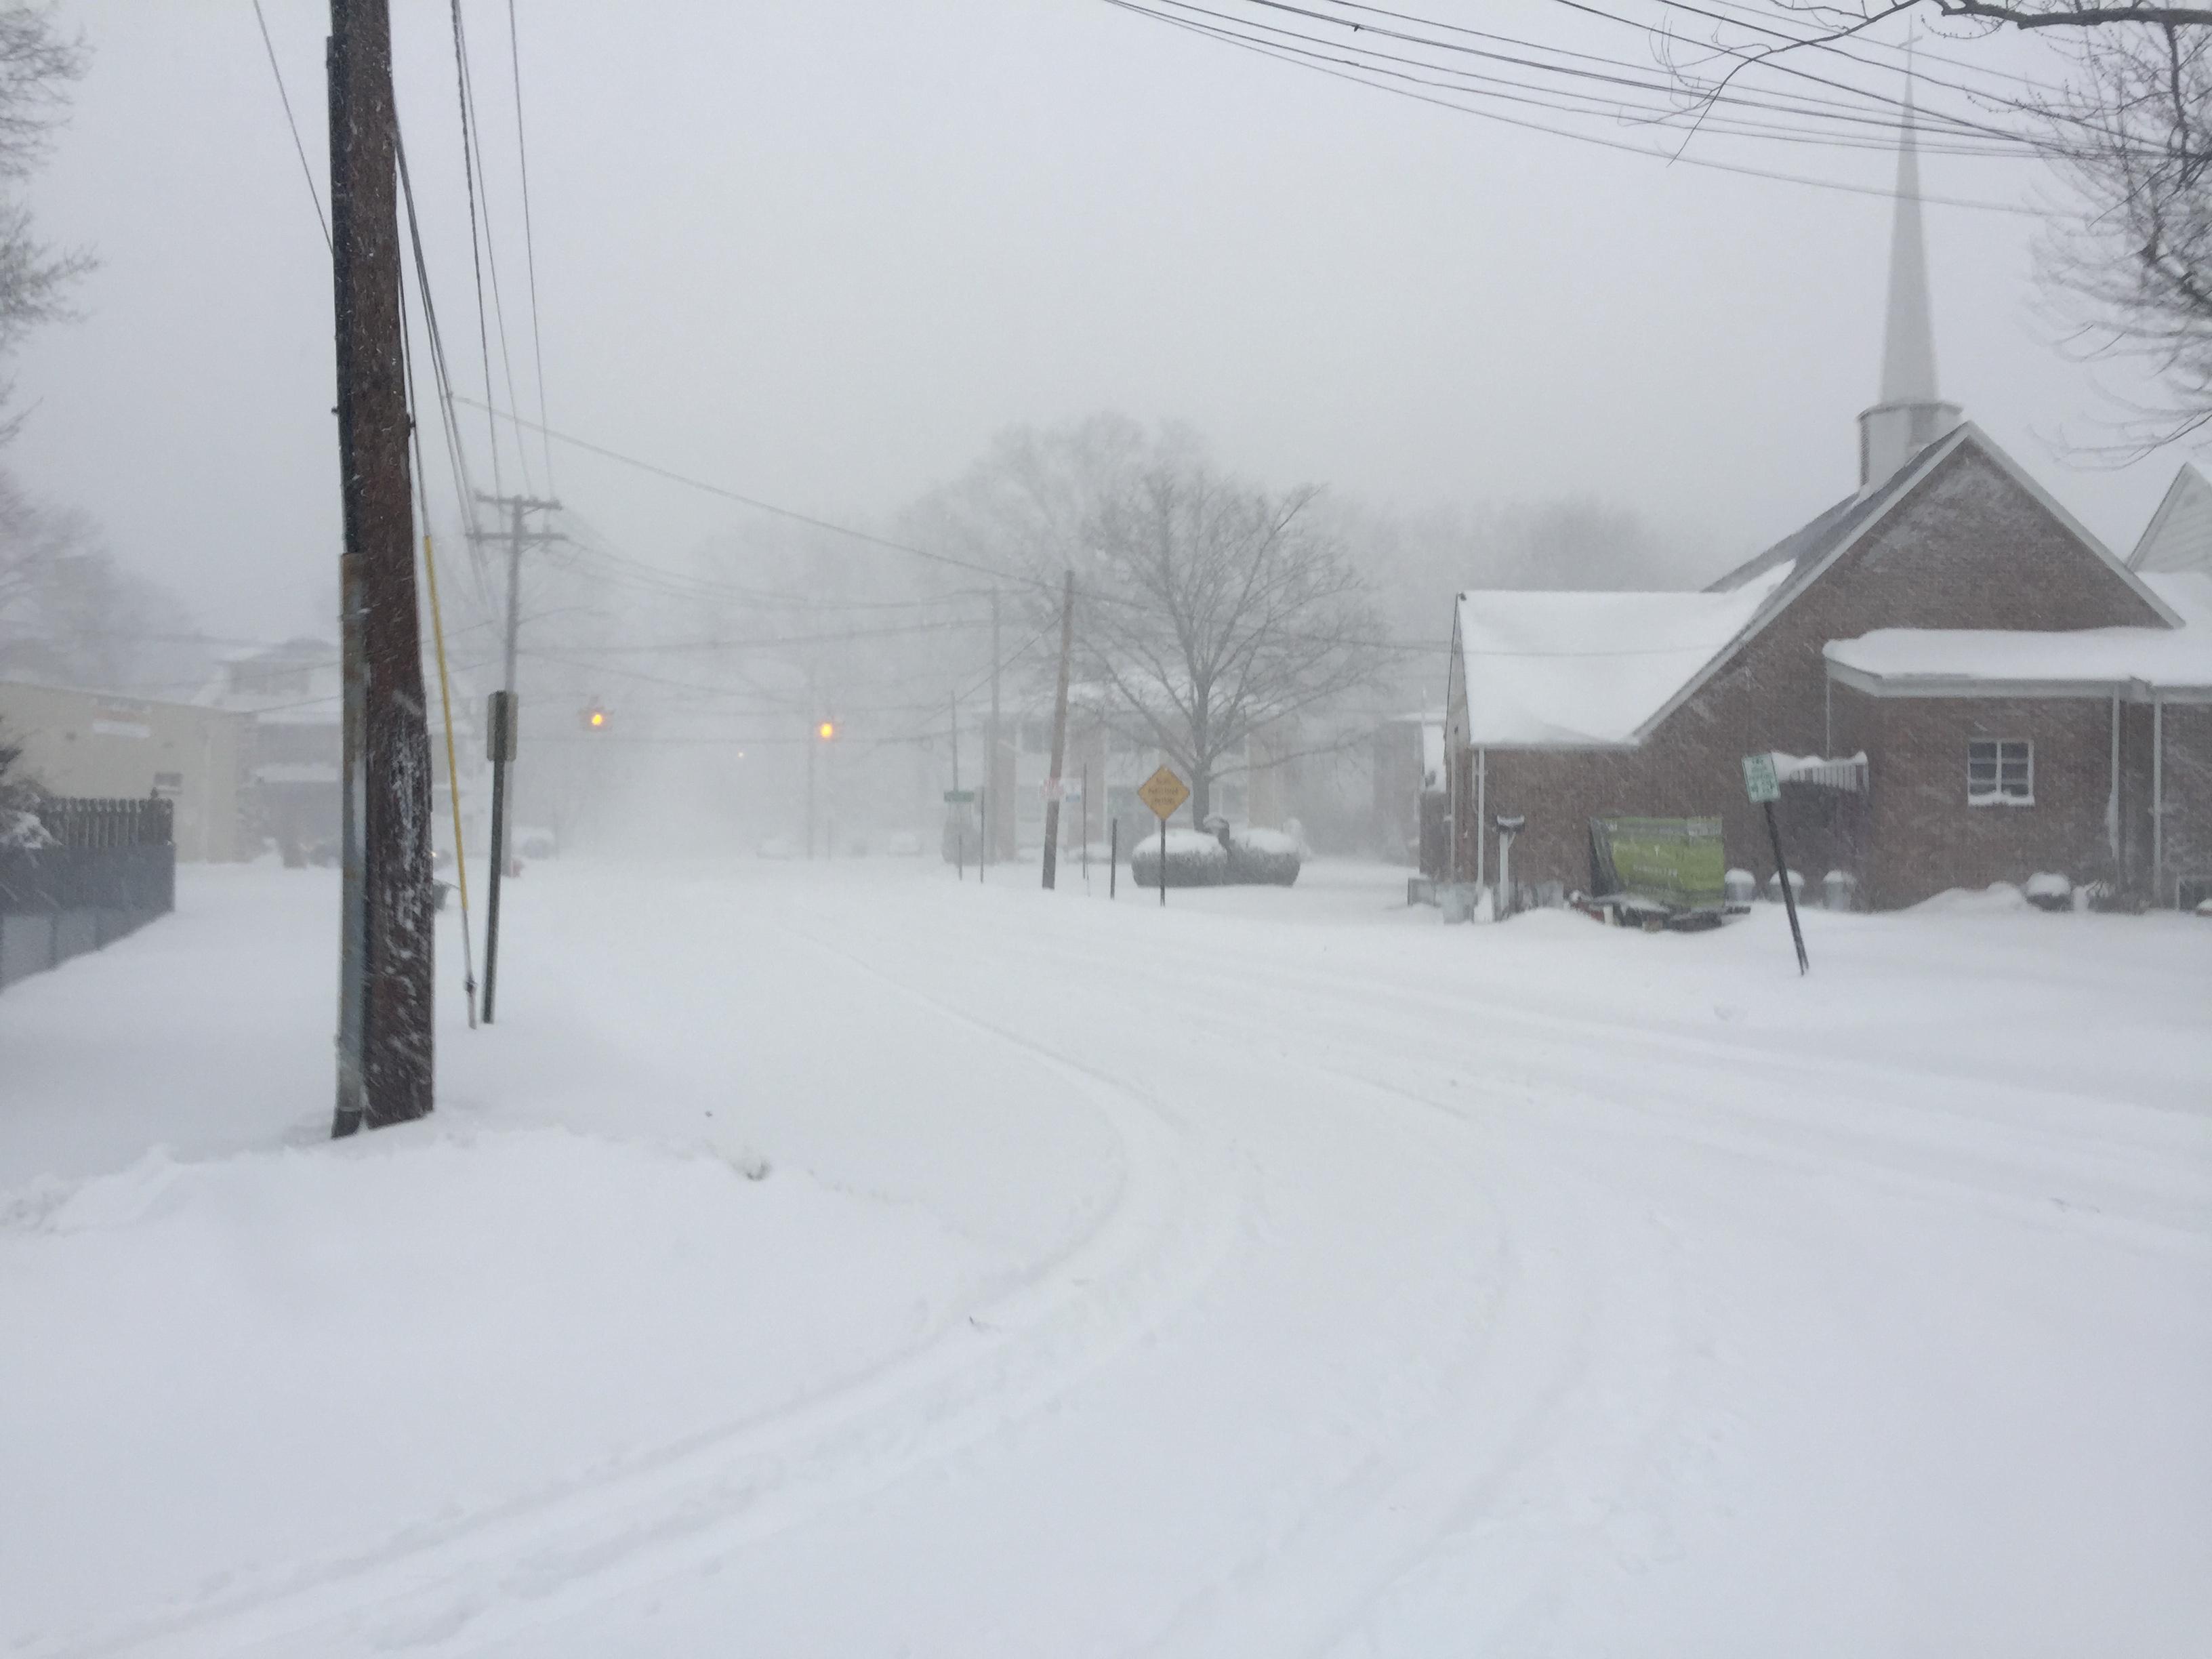 63584dc9fc4b2786d08e_snow_storm_1-23-16_3.jpg